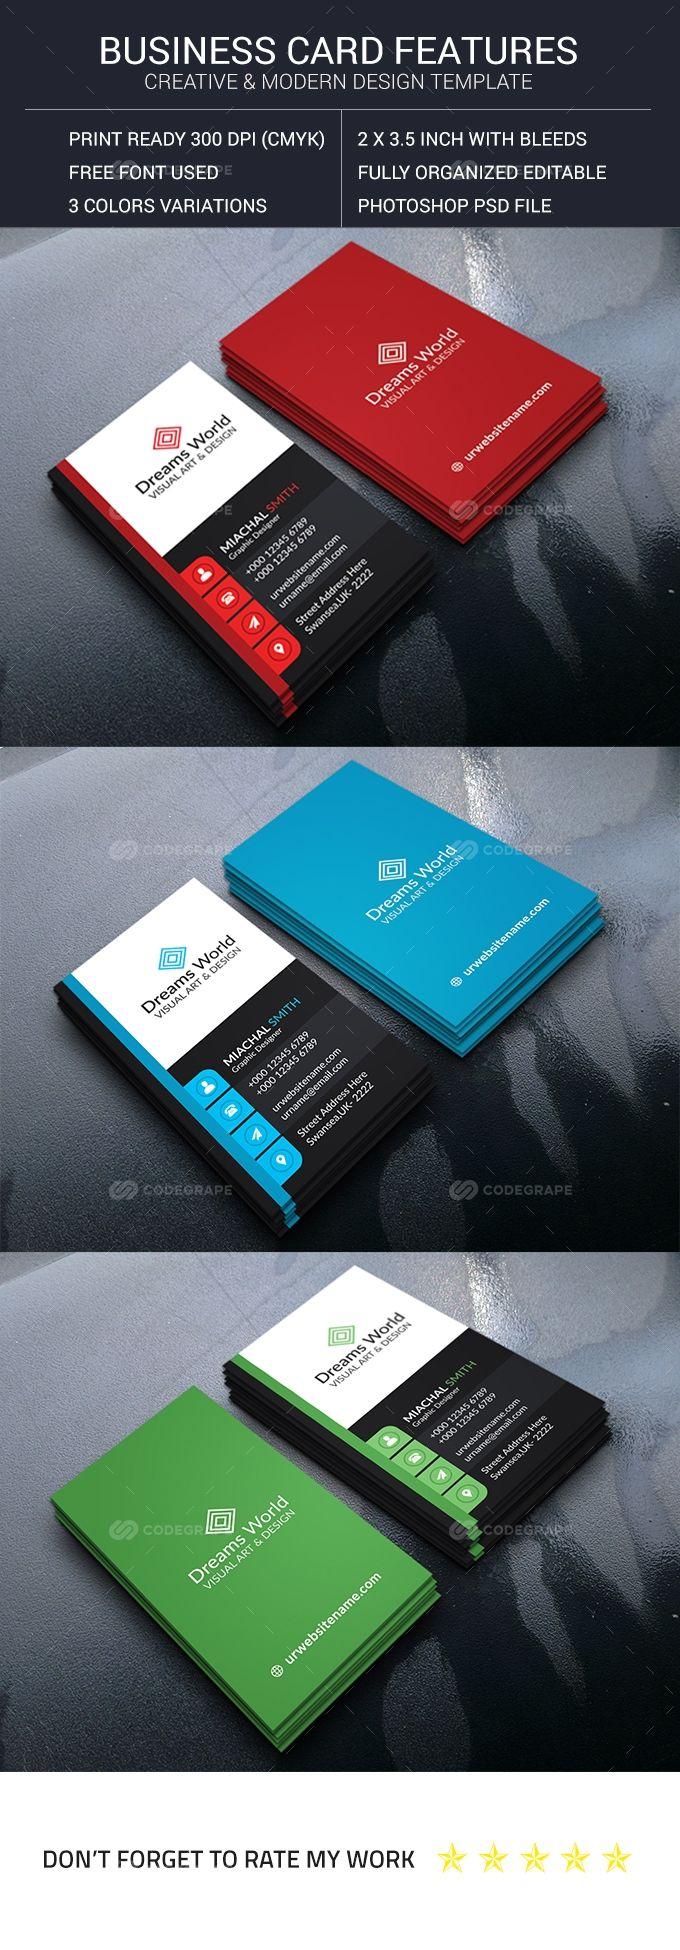 Vertical Creative Business Card Business Cards Creative Free Business Card Design Business Card Design